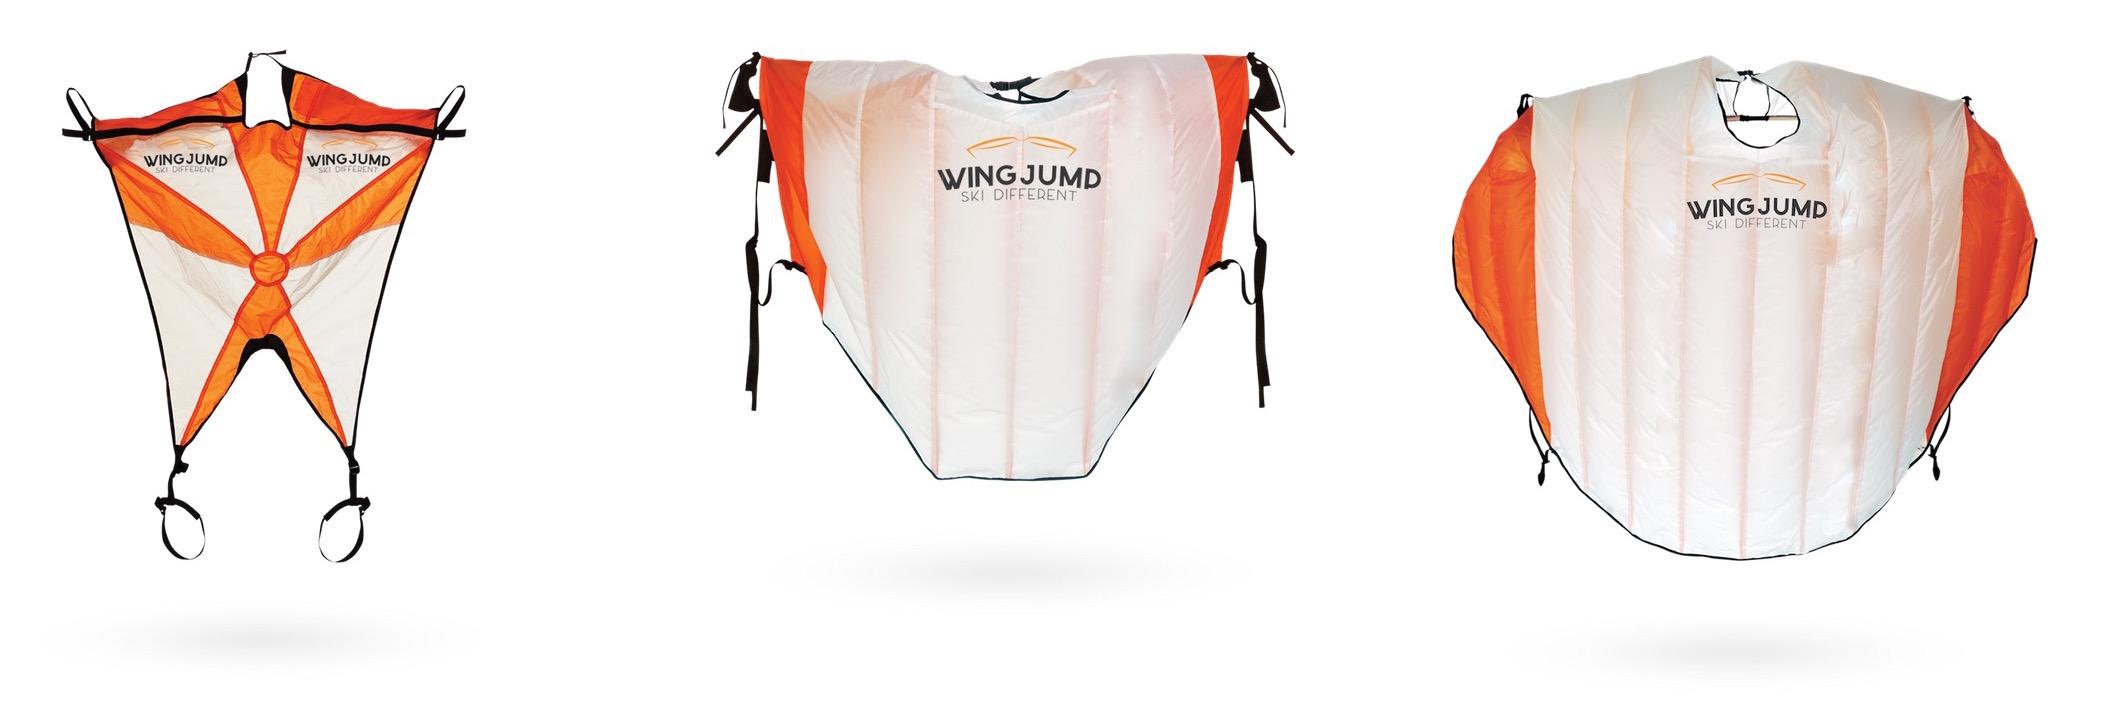 wingjump